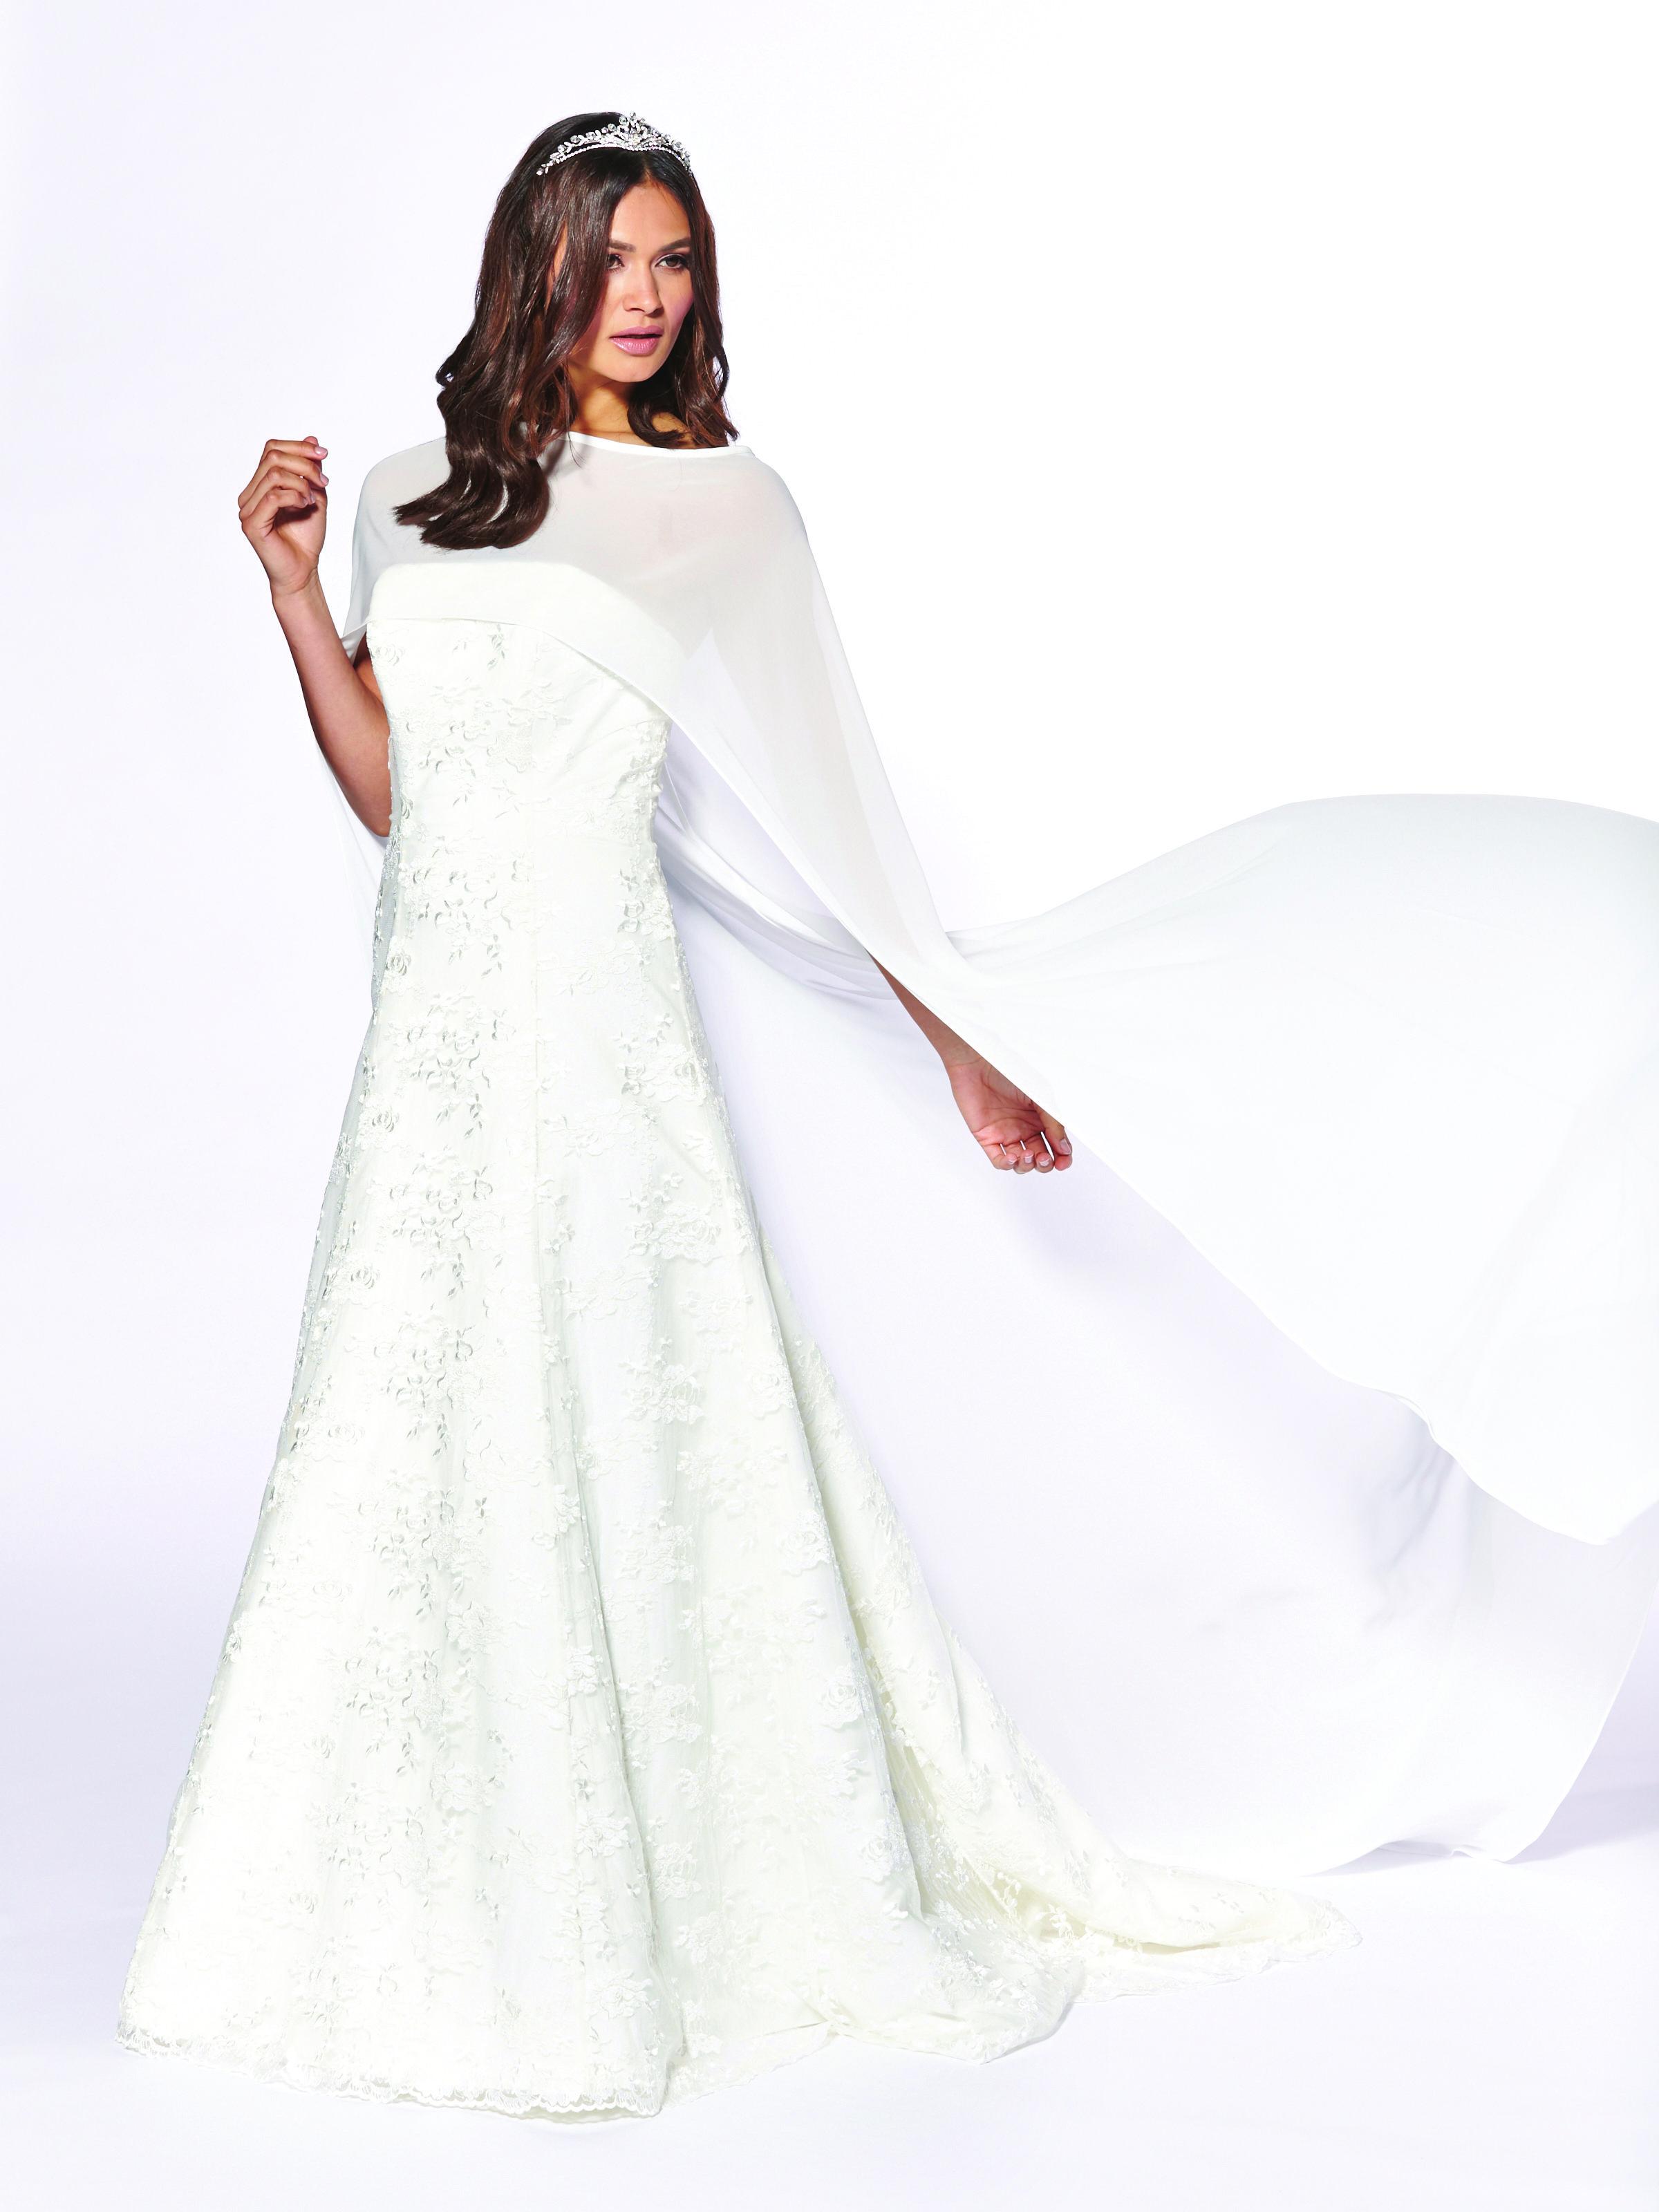 Winter wonderland wedding dress  Chiffon Bridal Cape GACAPE  Winter Wedding  Pinterest  Bridal